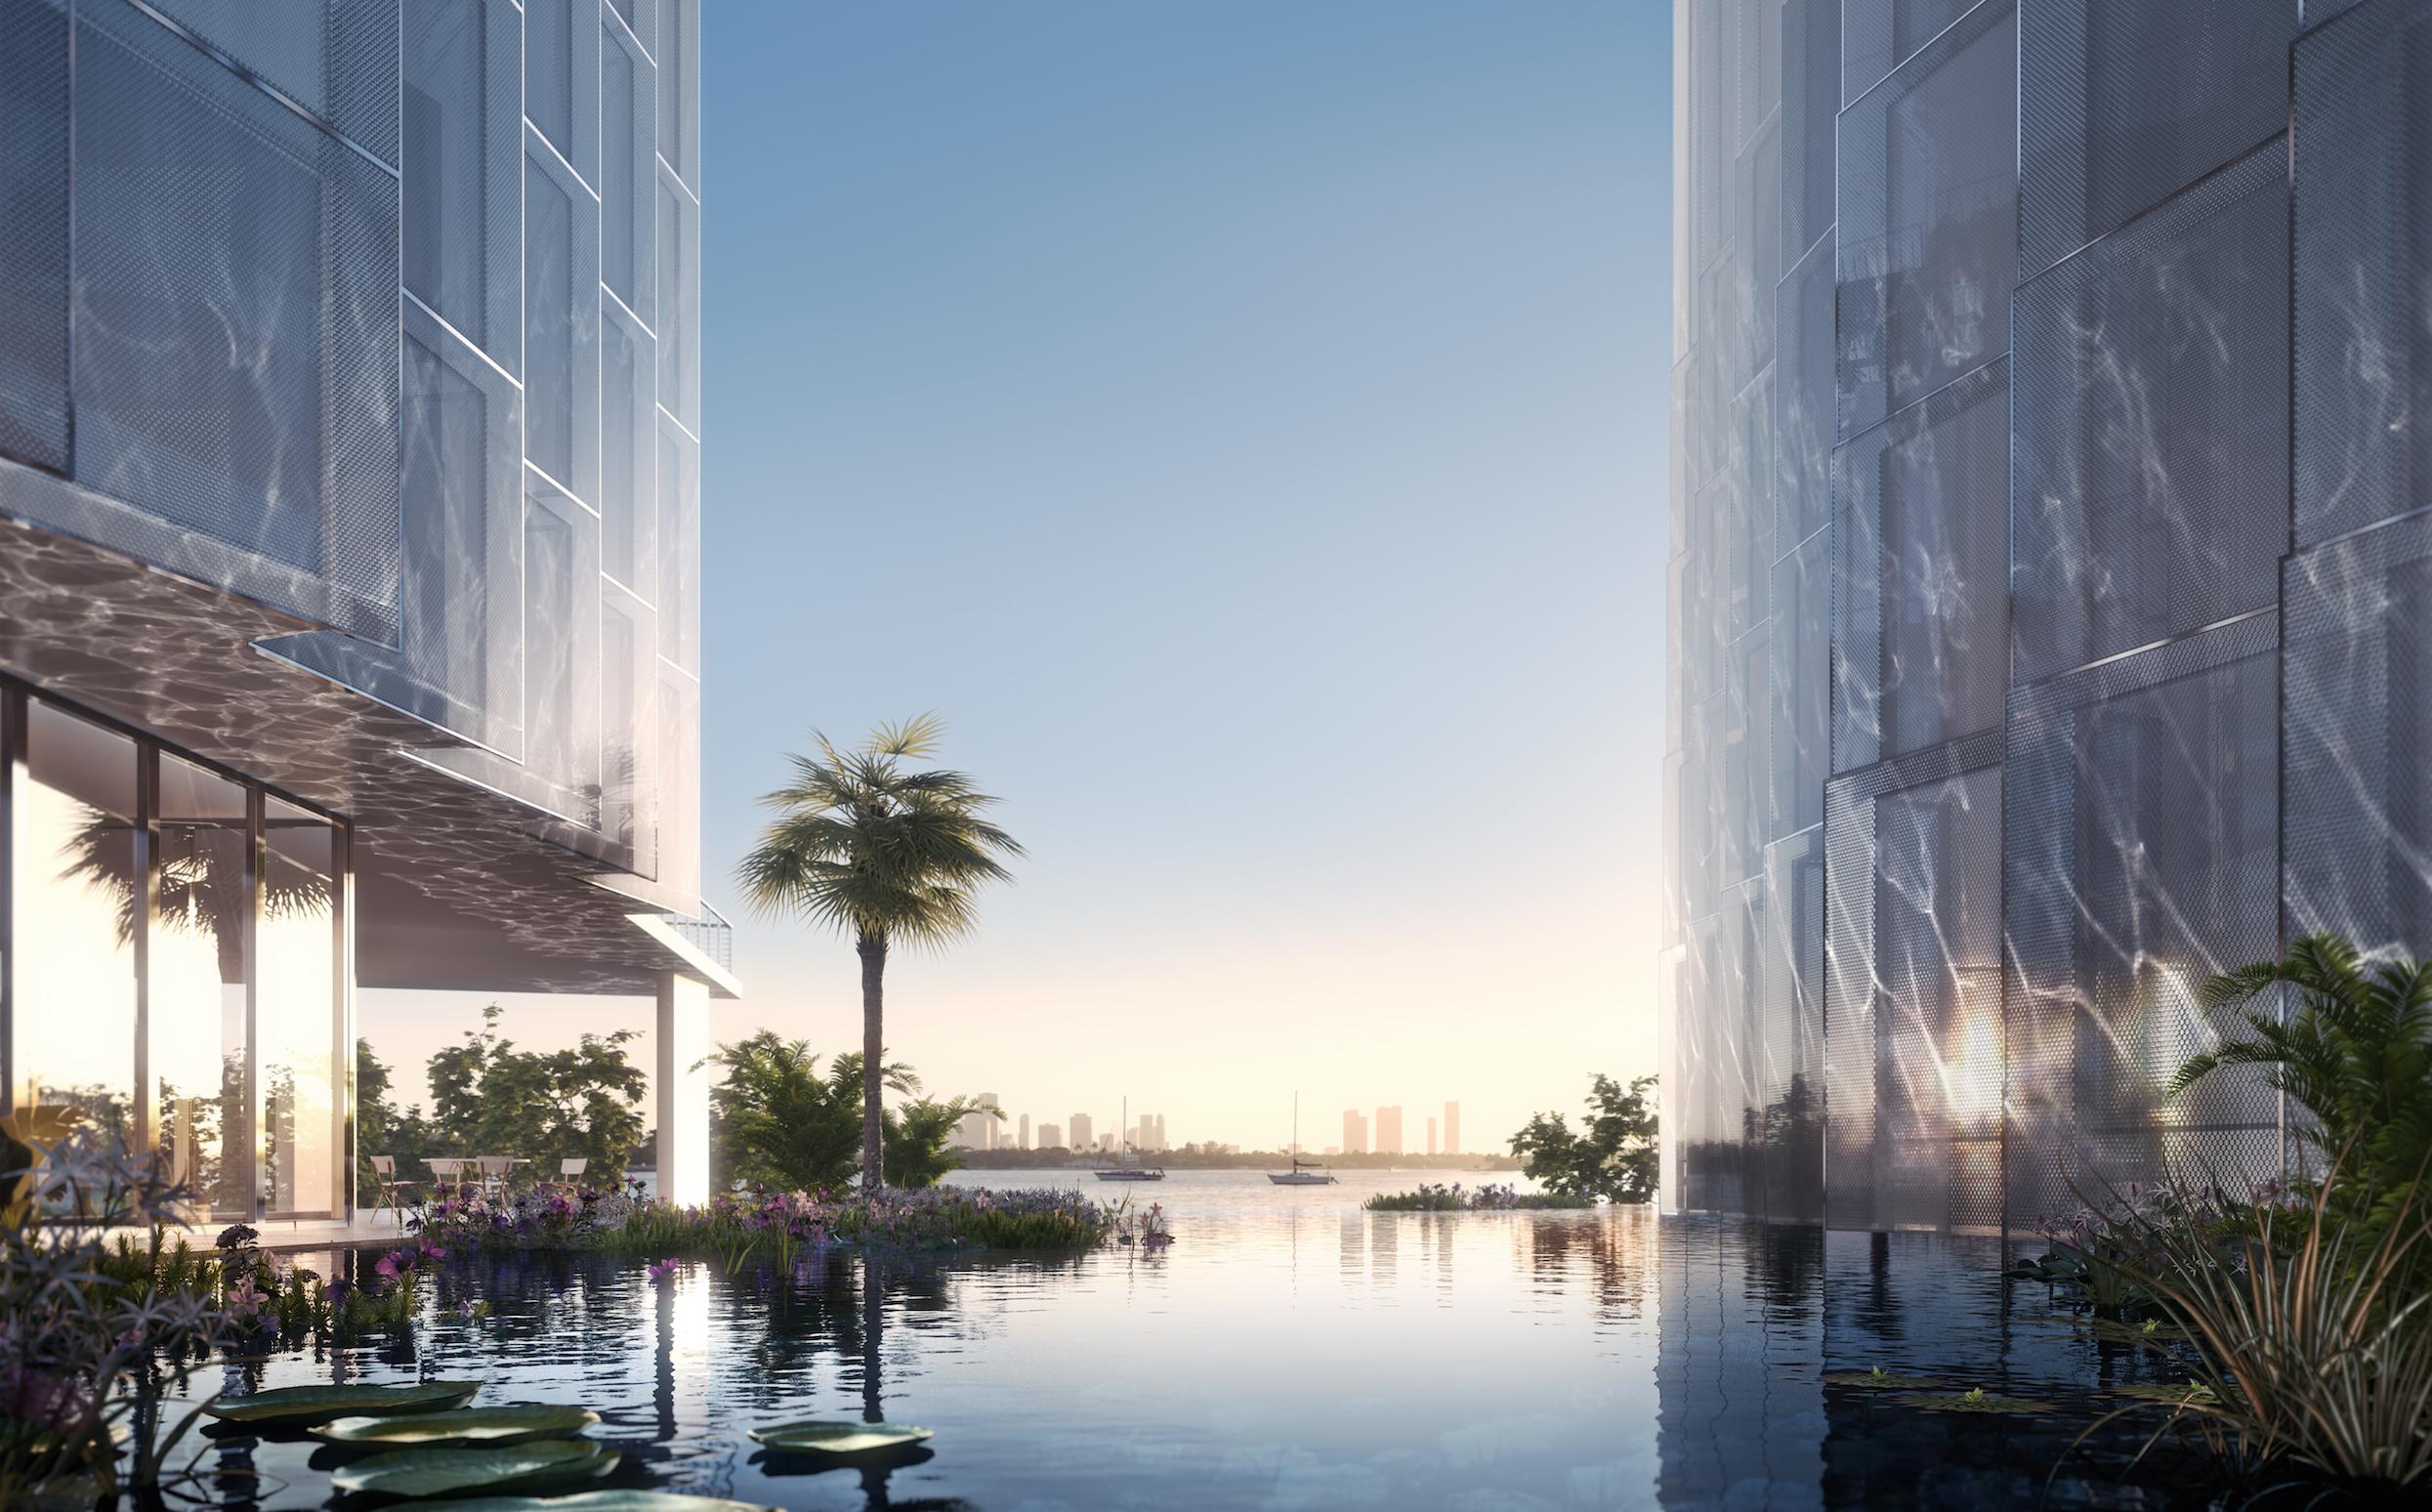 JDS Development Group Secures $137 Million In Construction Financing For The Jean Nouvel-Designed Monad Terrace